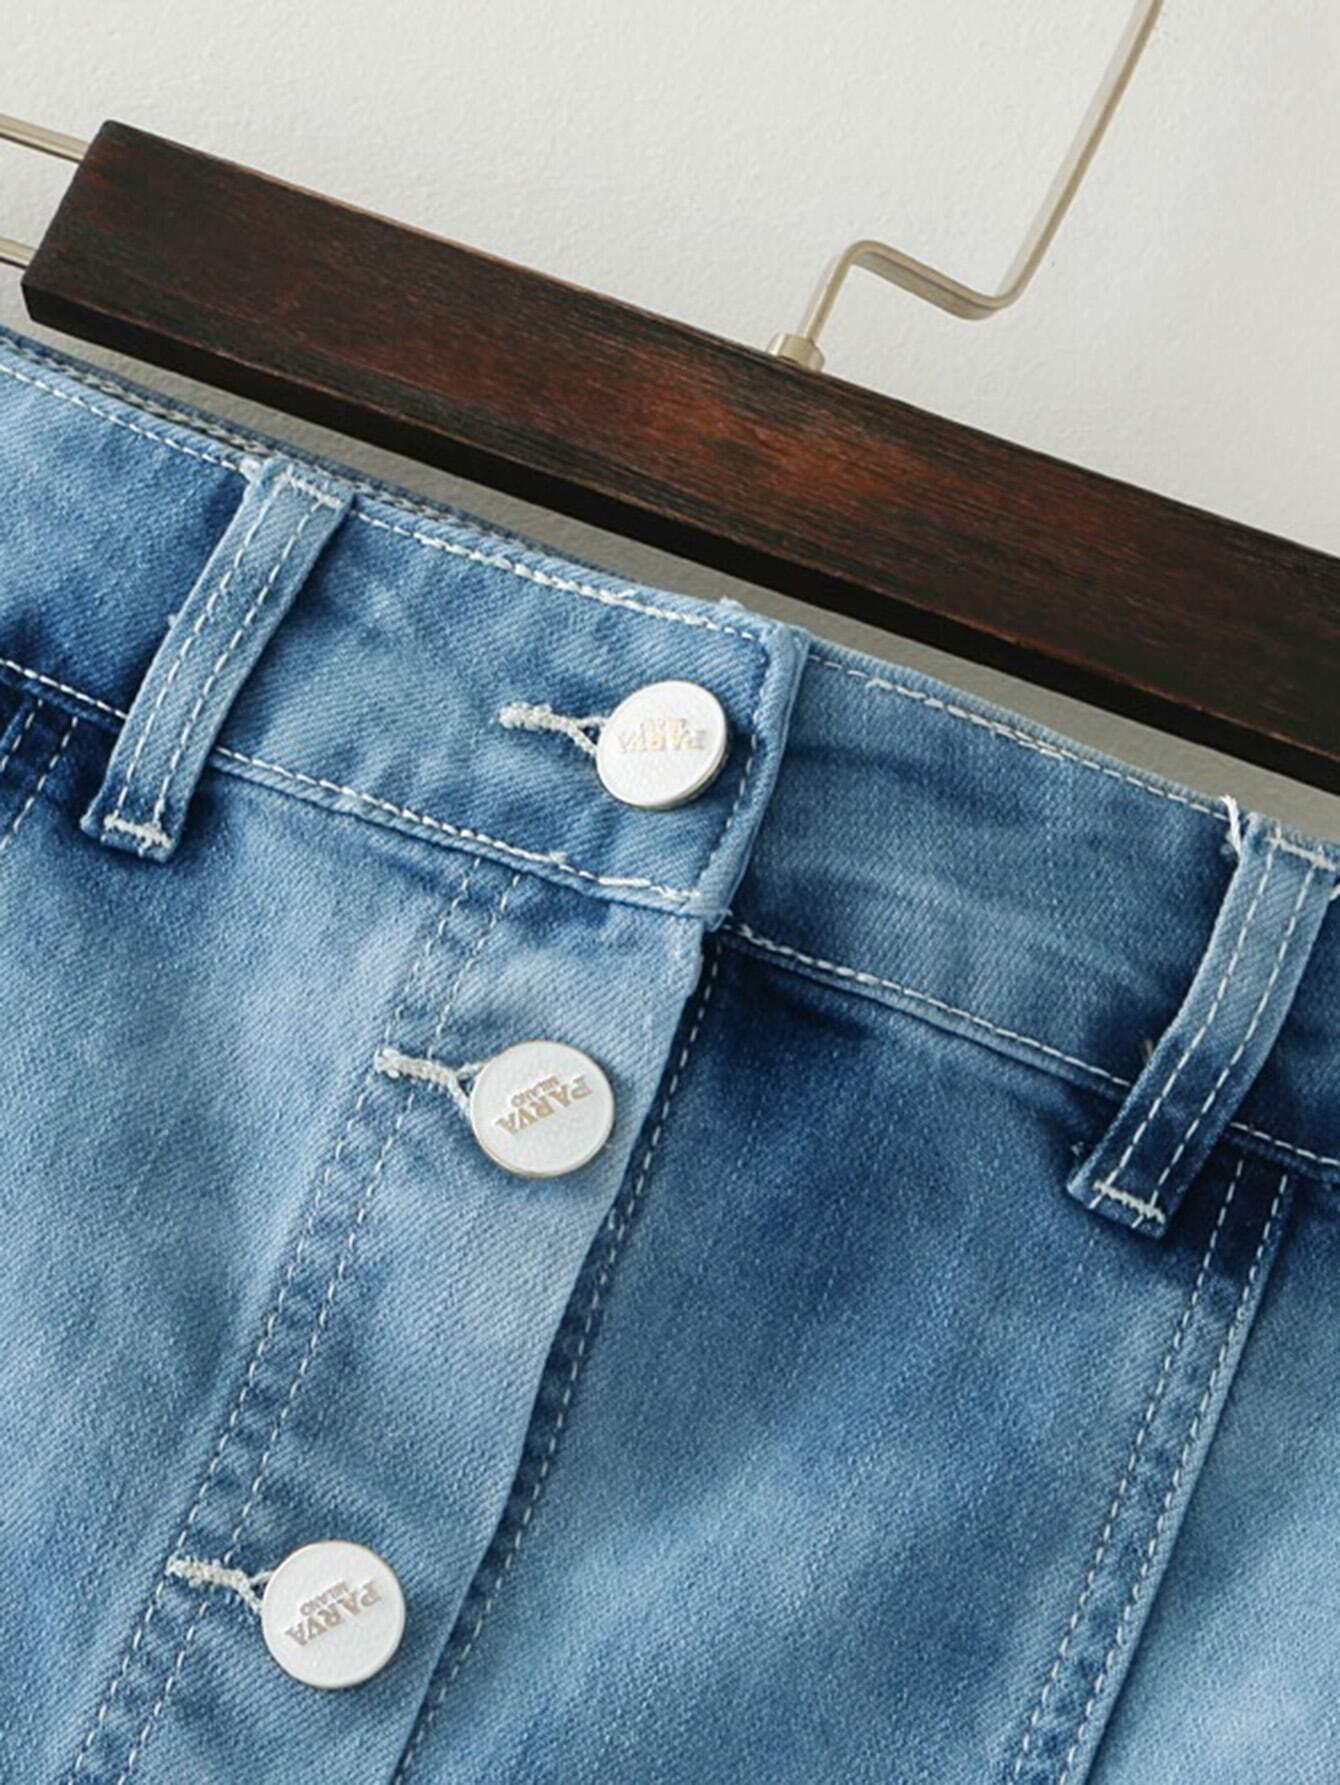 jupe en jeans a line brod fleur avec pan d chir. Black Bedroom Furniture Sets. Home Design Ideas